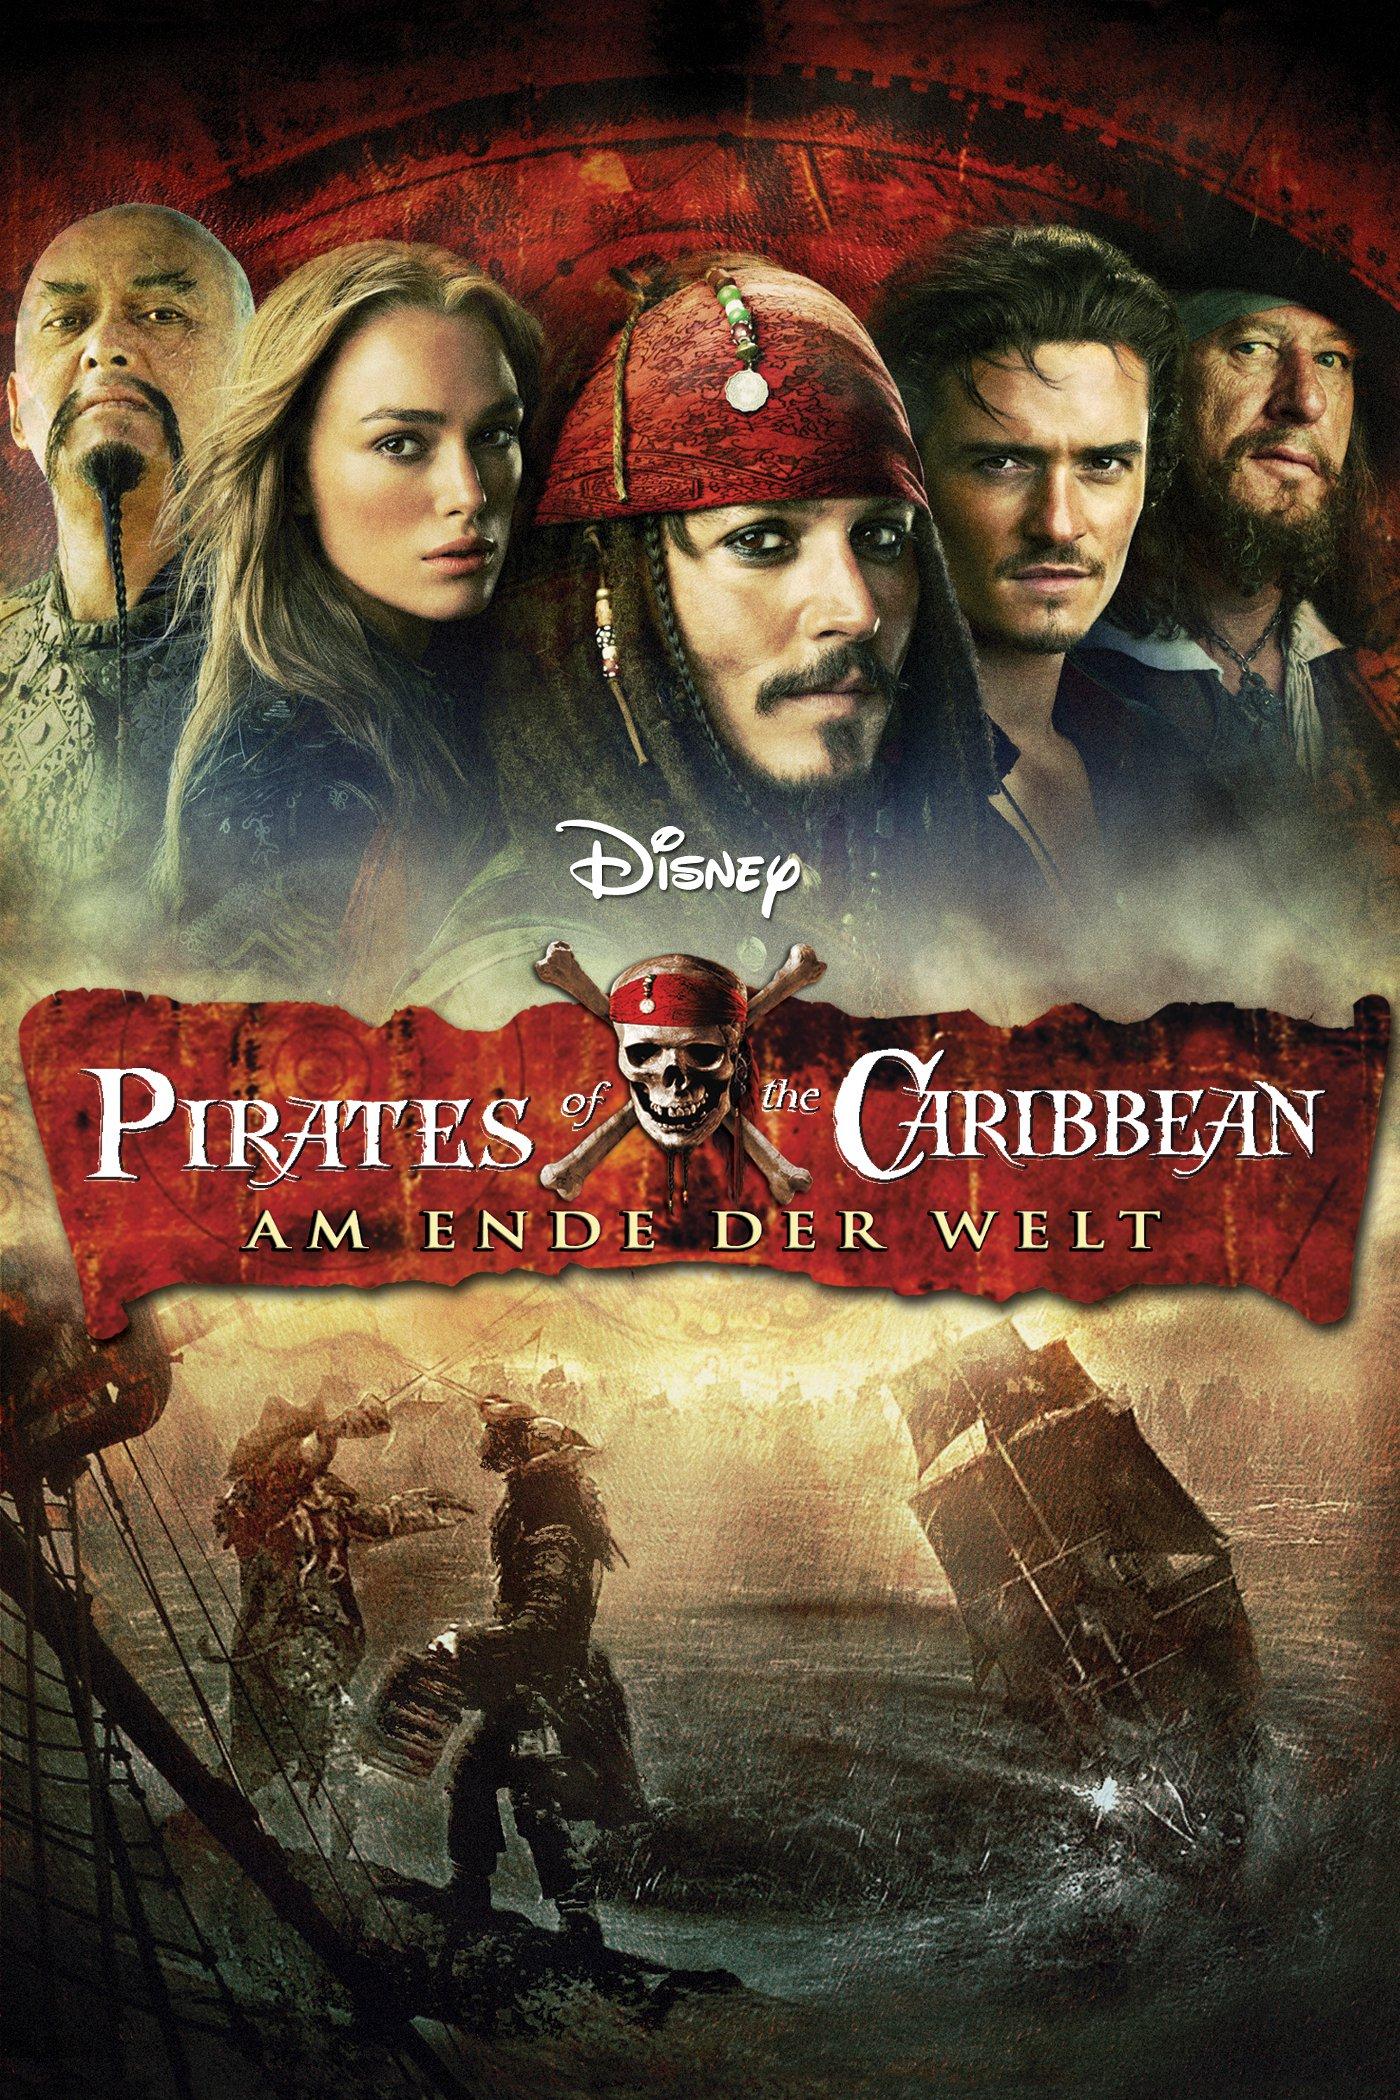 """Pirates of the Caribbean - Am Ende der Welt"""